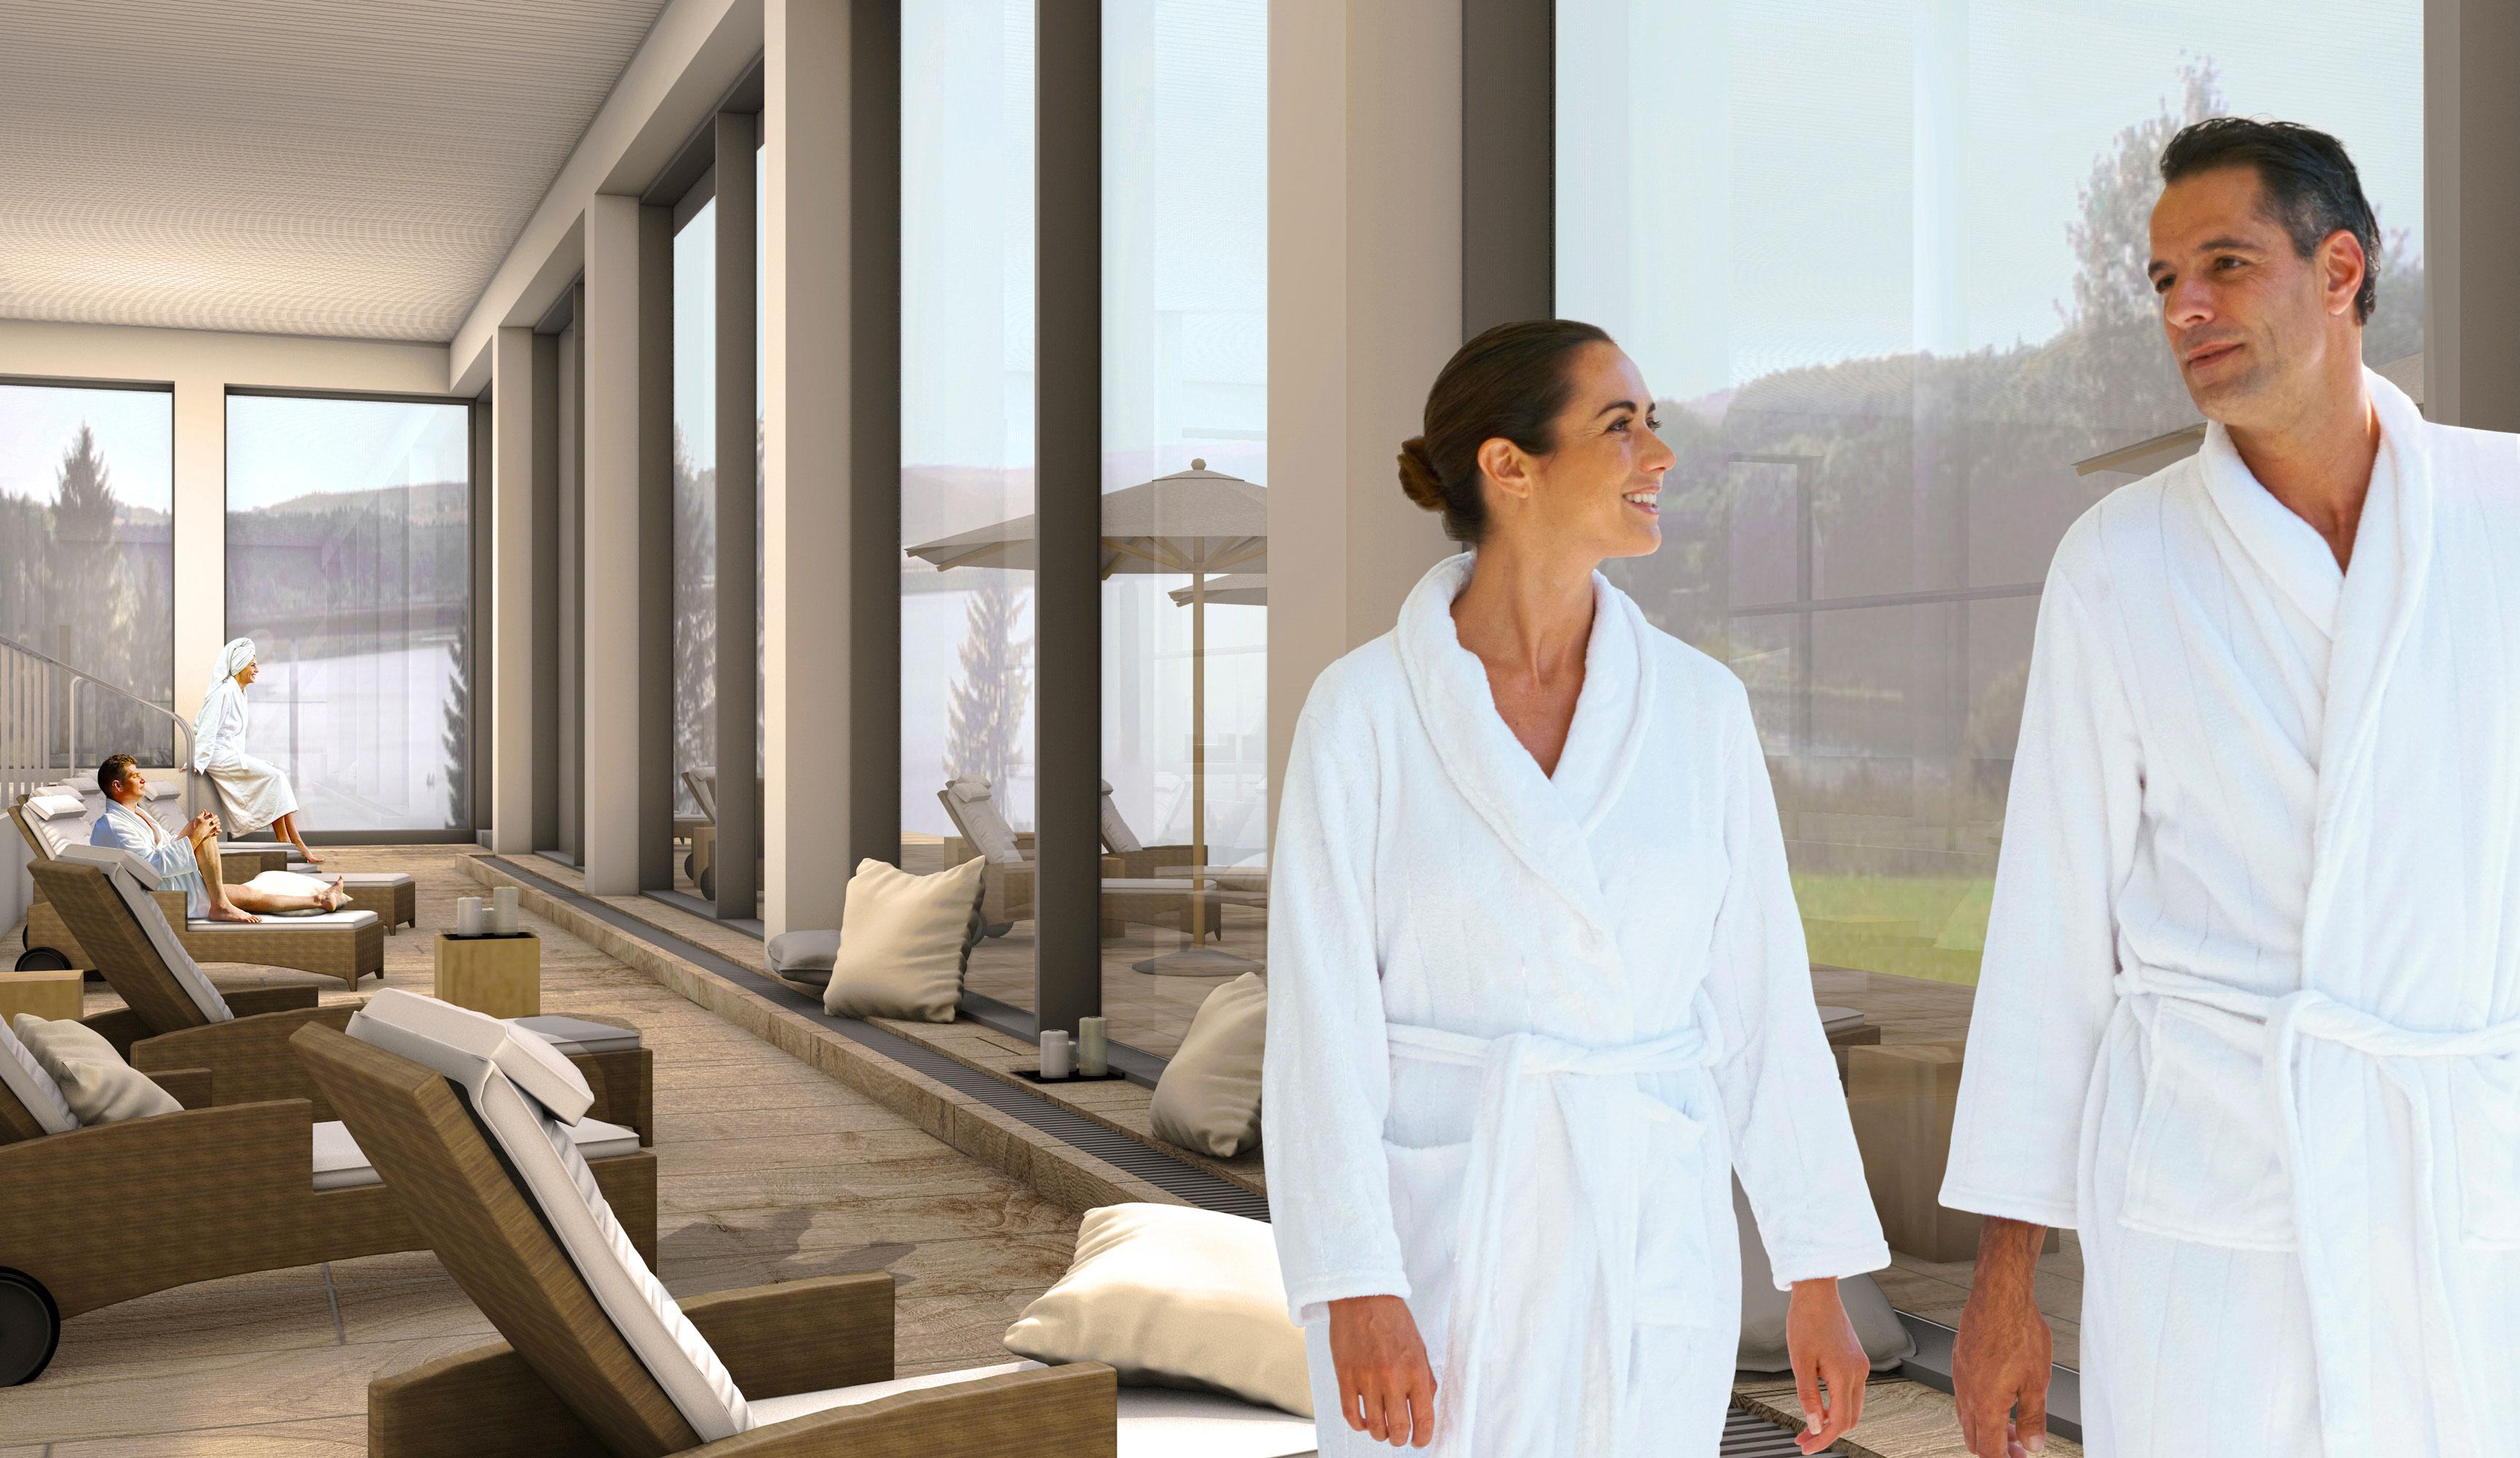 Abb. zu Neueröffnung des Panorama Spa im Bio-Seehotel Zeulenroda